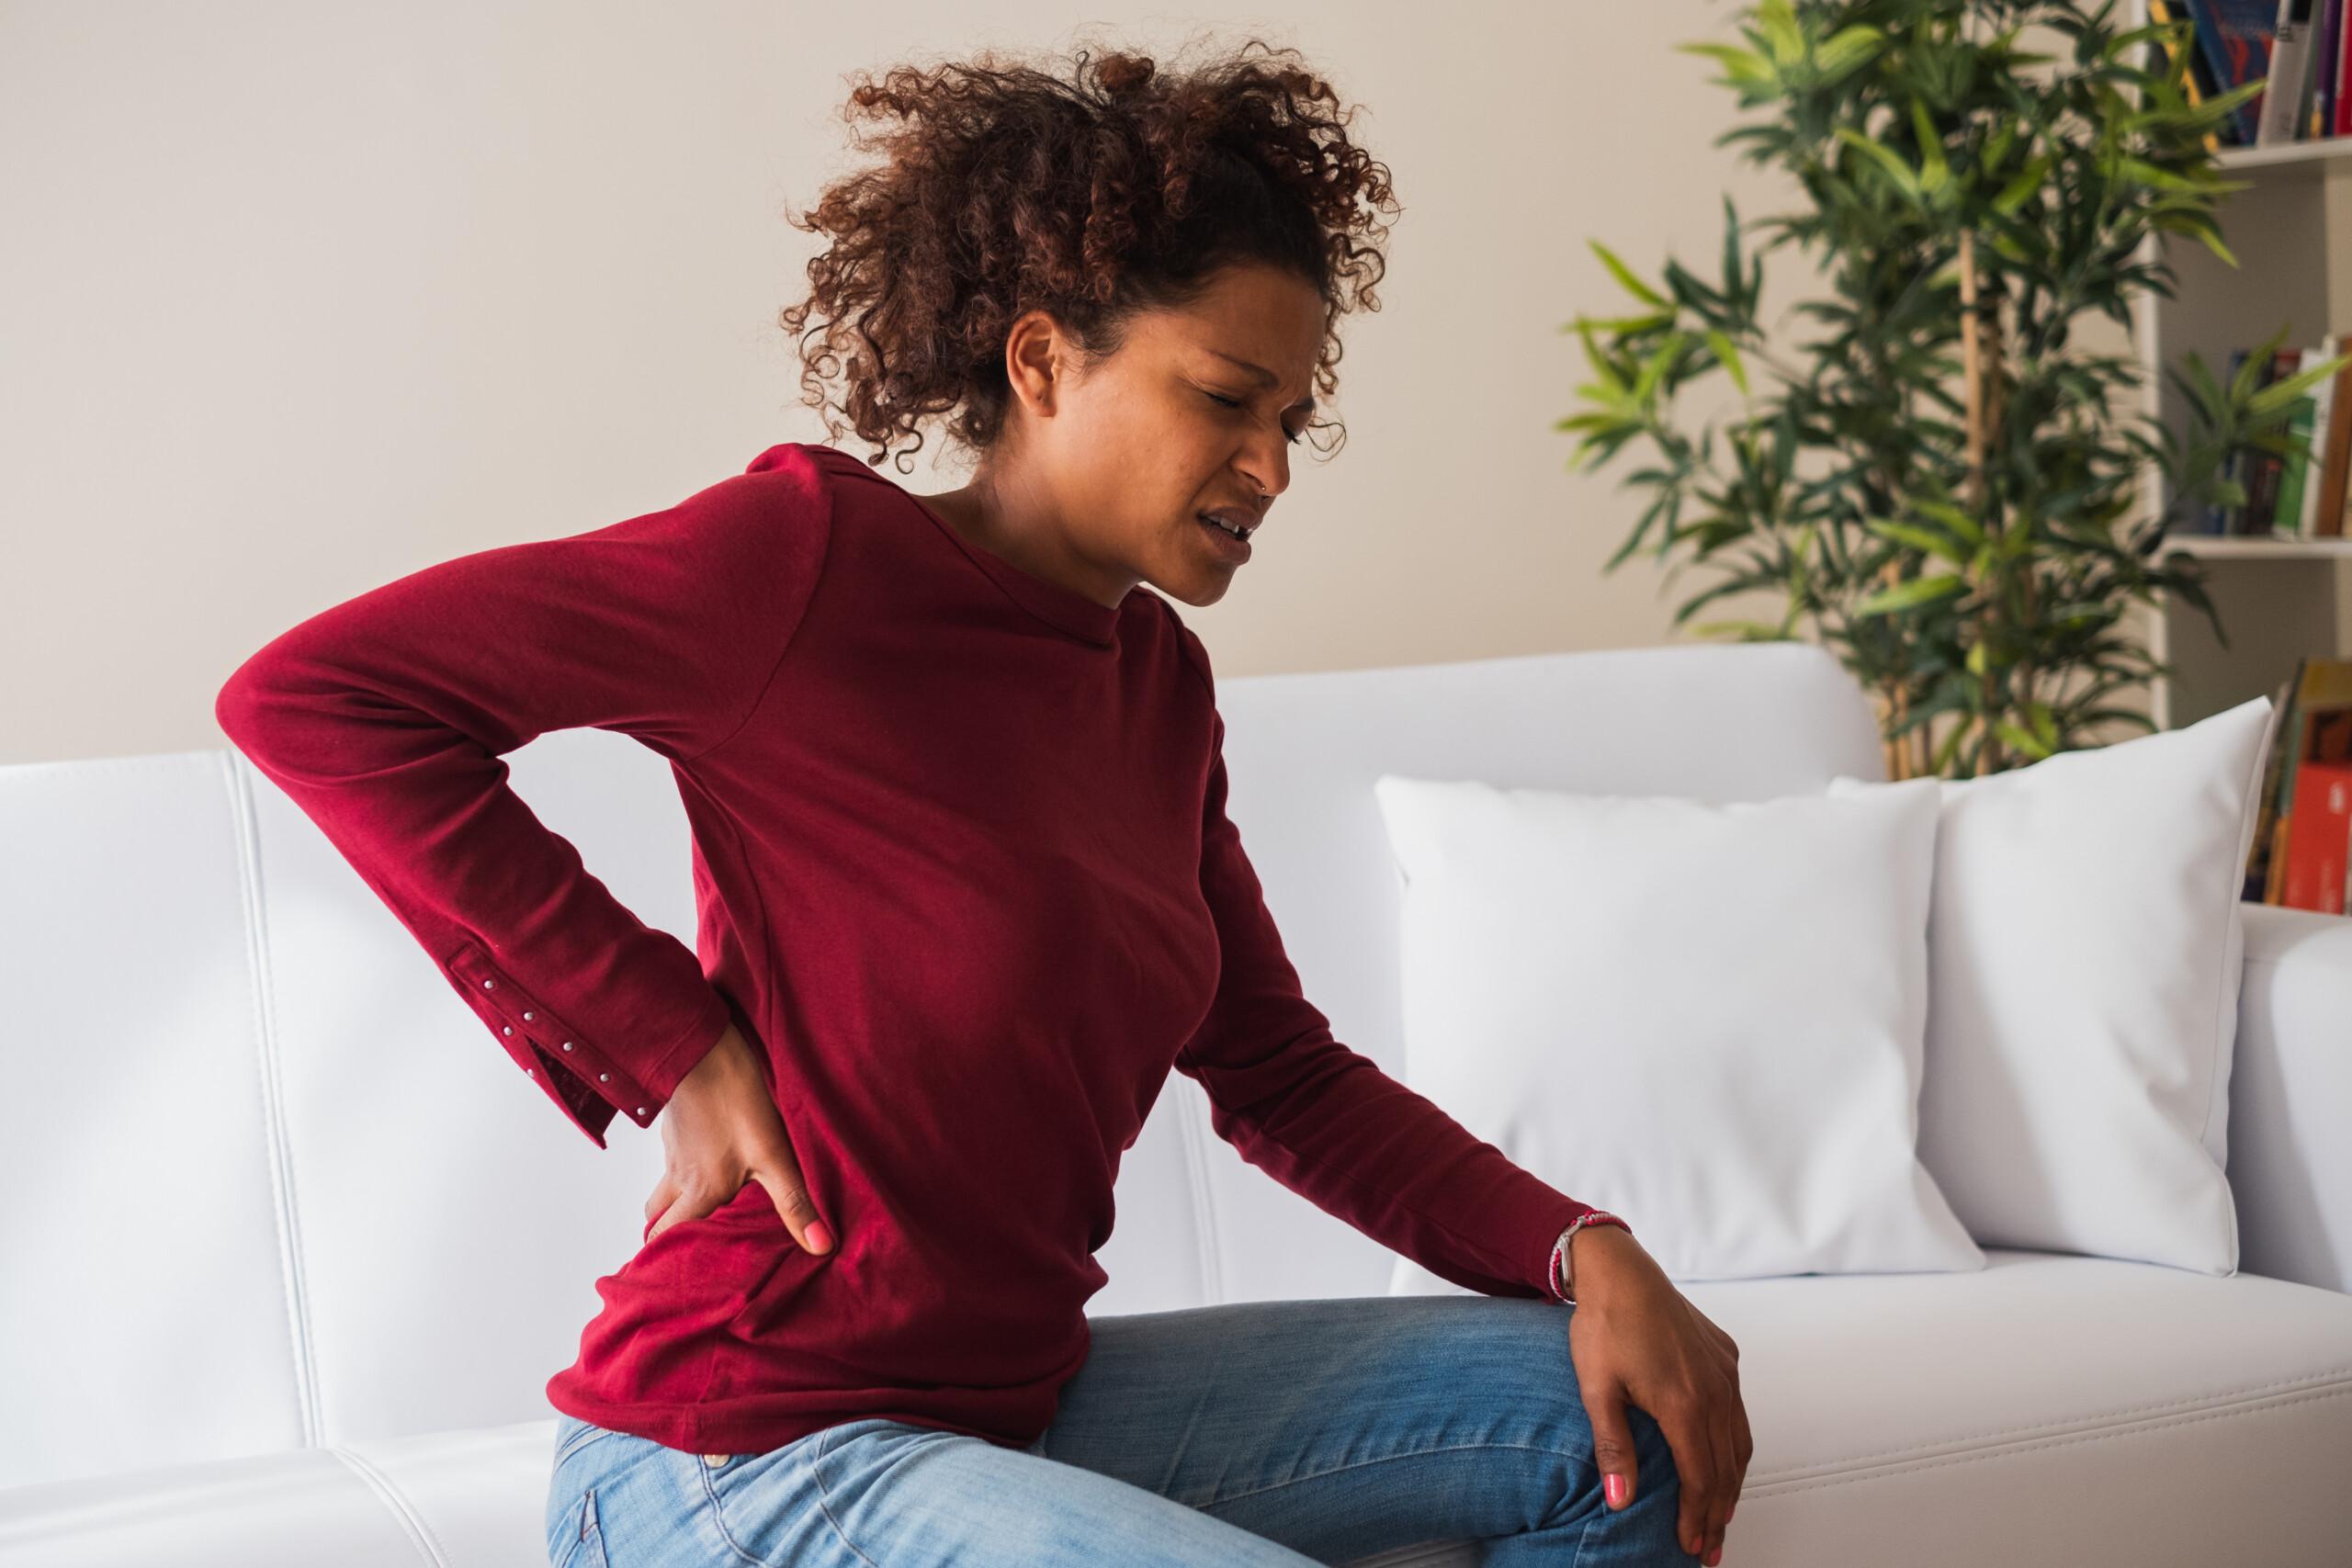 Does Slow Walking on a Treadmill Desk Stiffen Your Back?